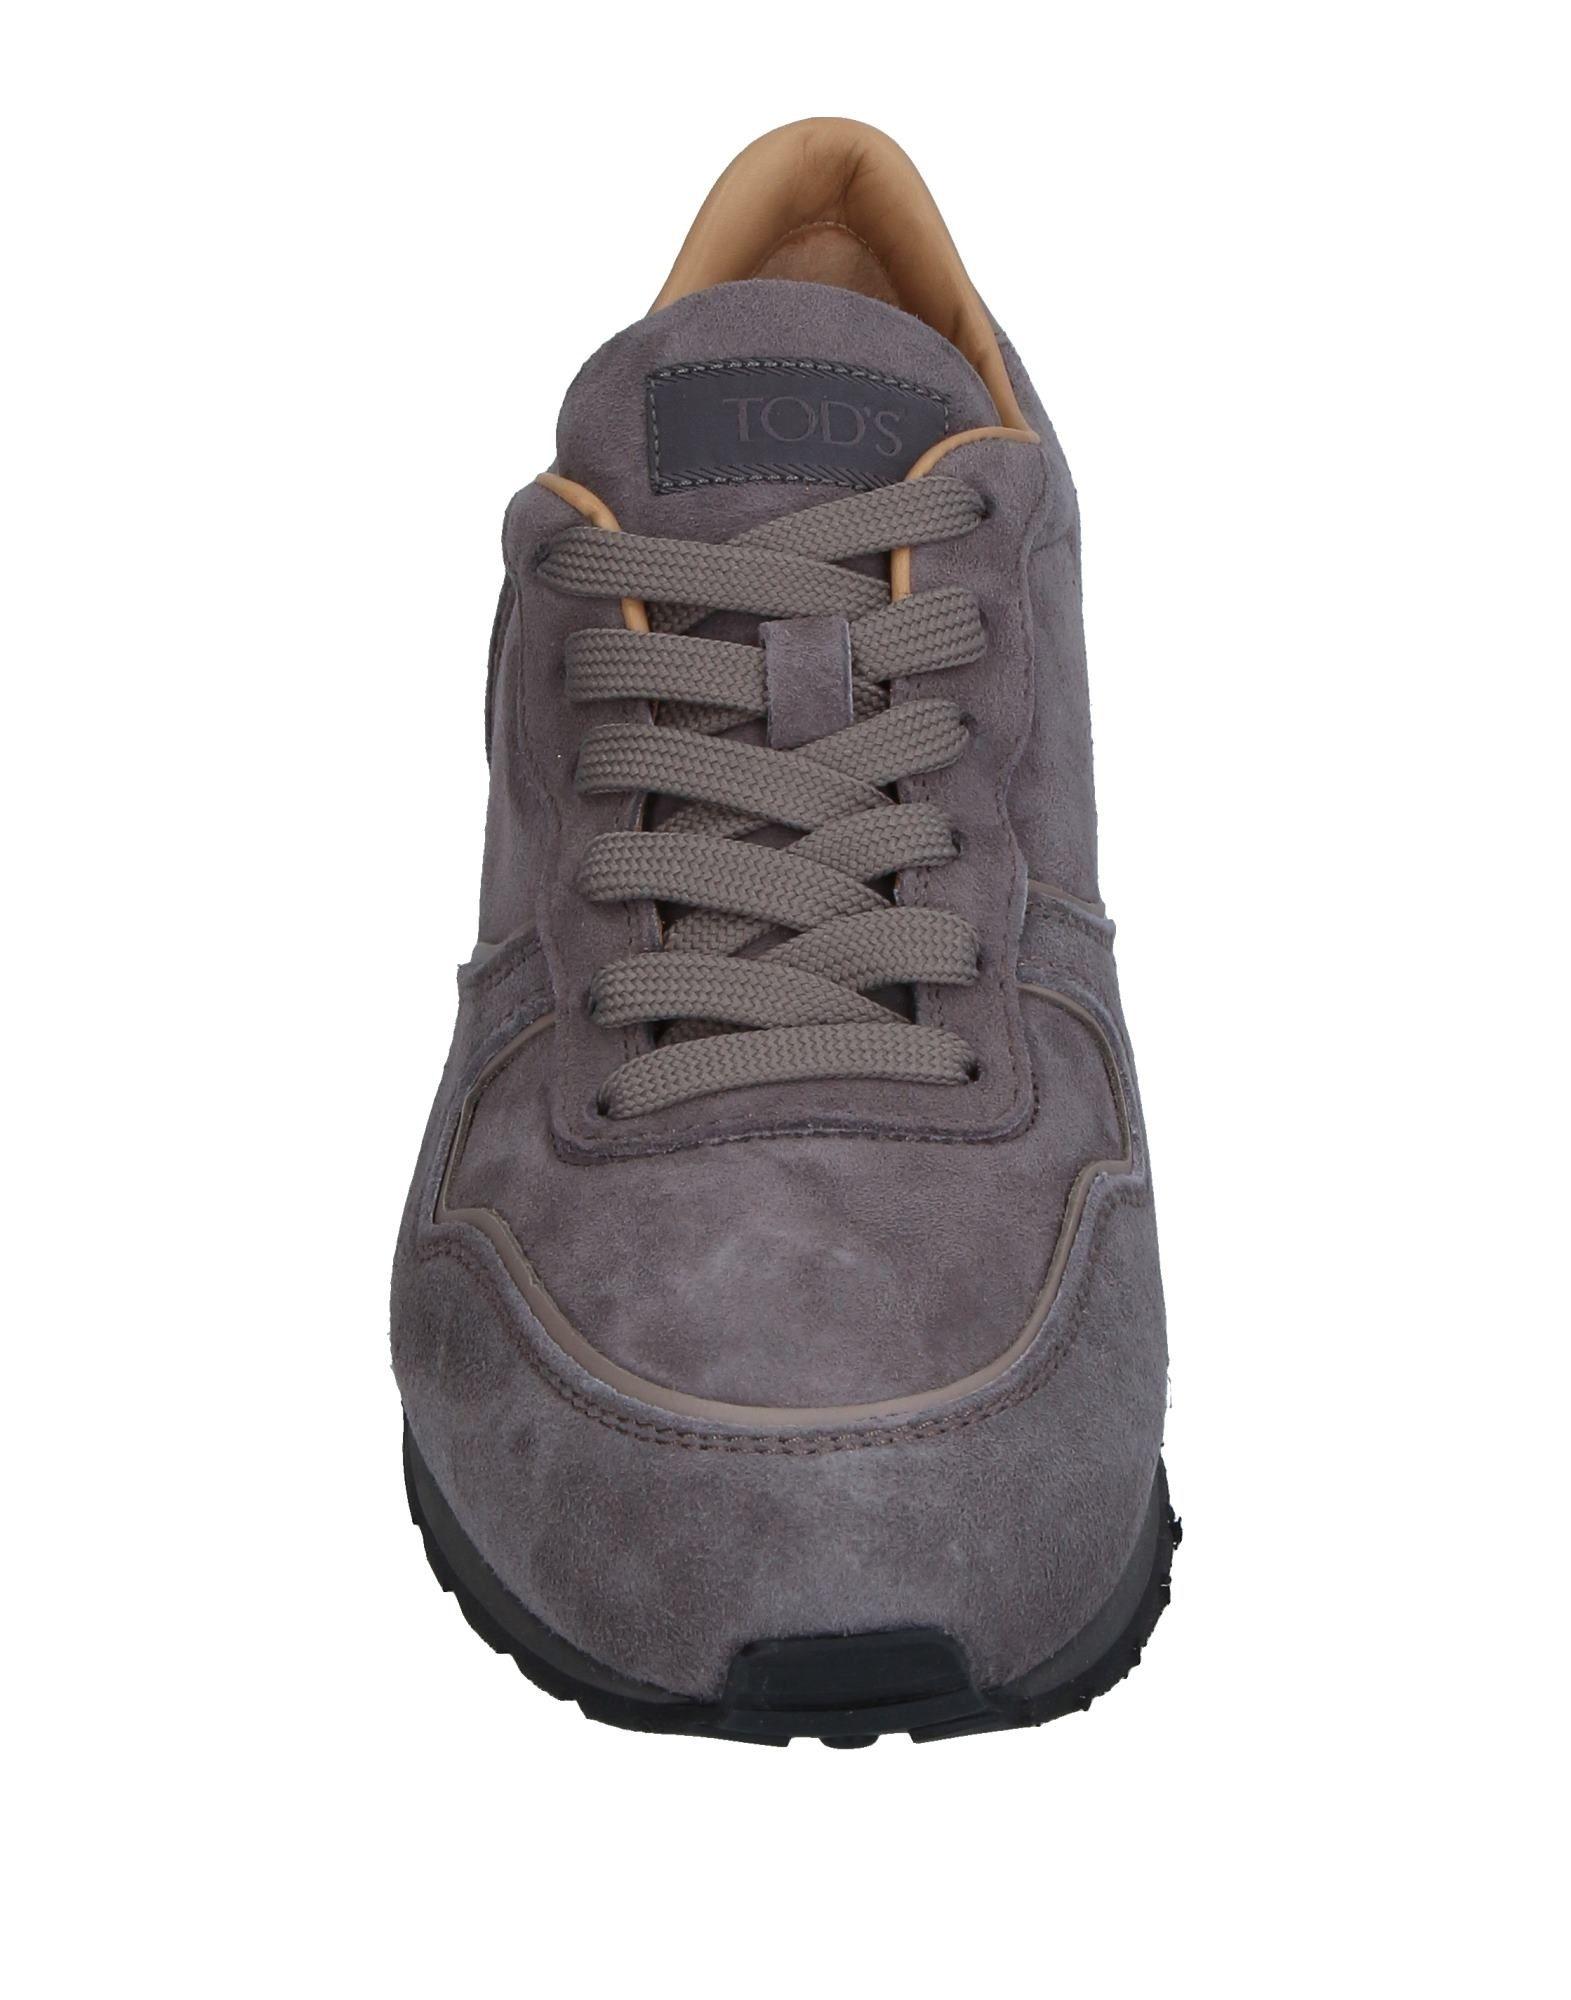 Sneakers Tod's Uomo elegante - 11249006LO elegante Uomo 6cc3b8